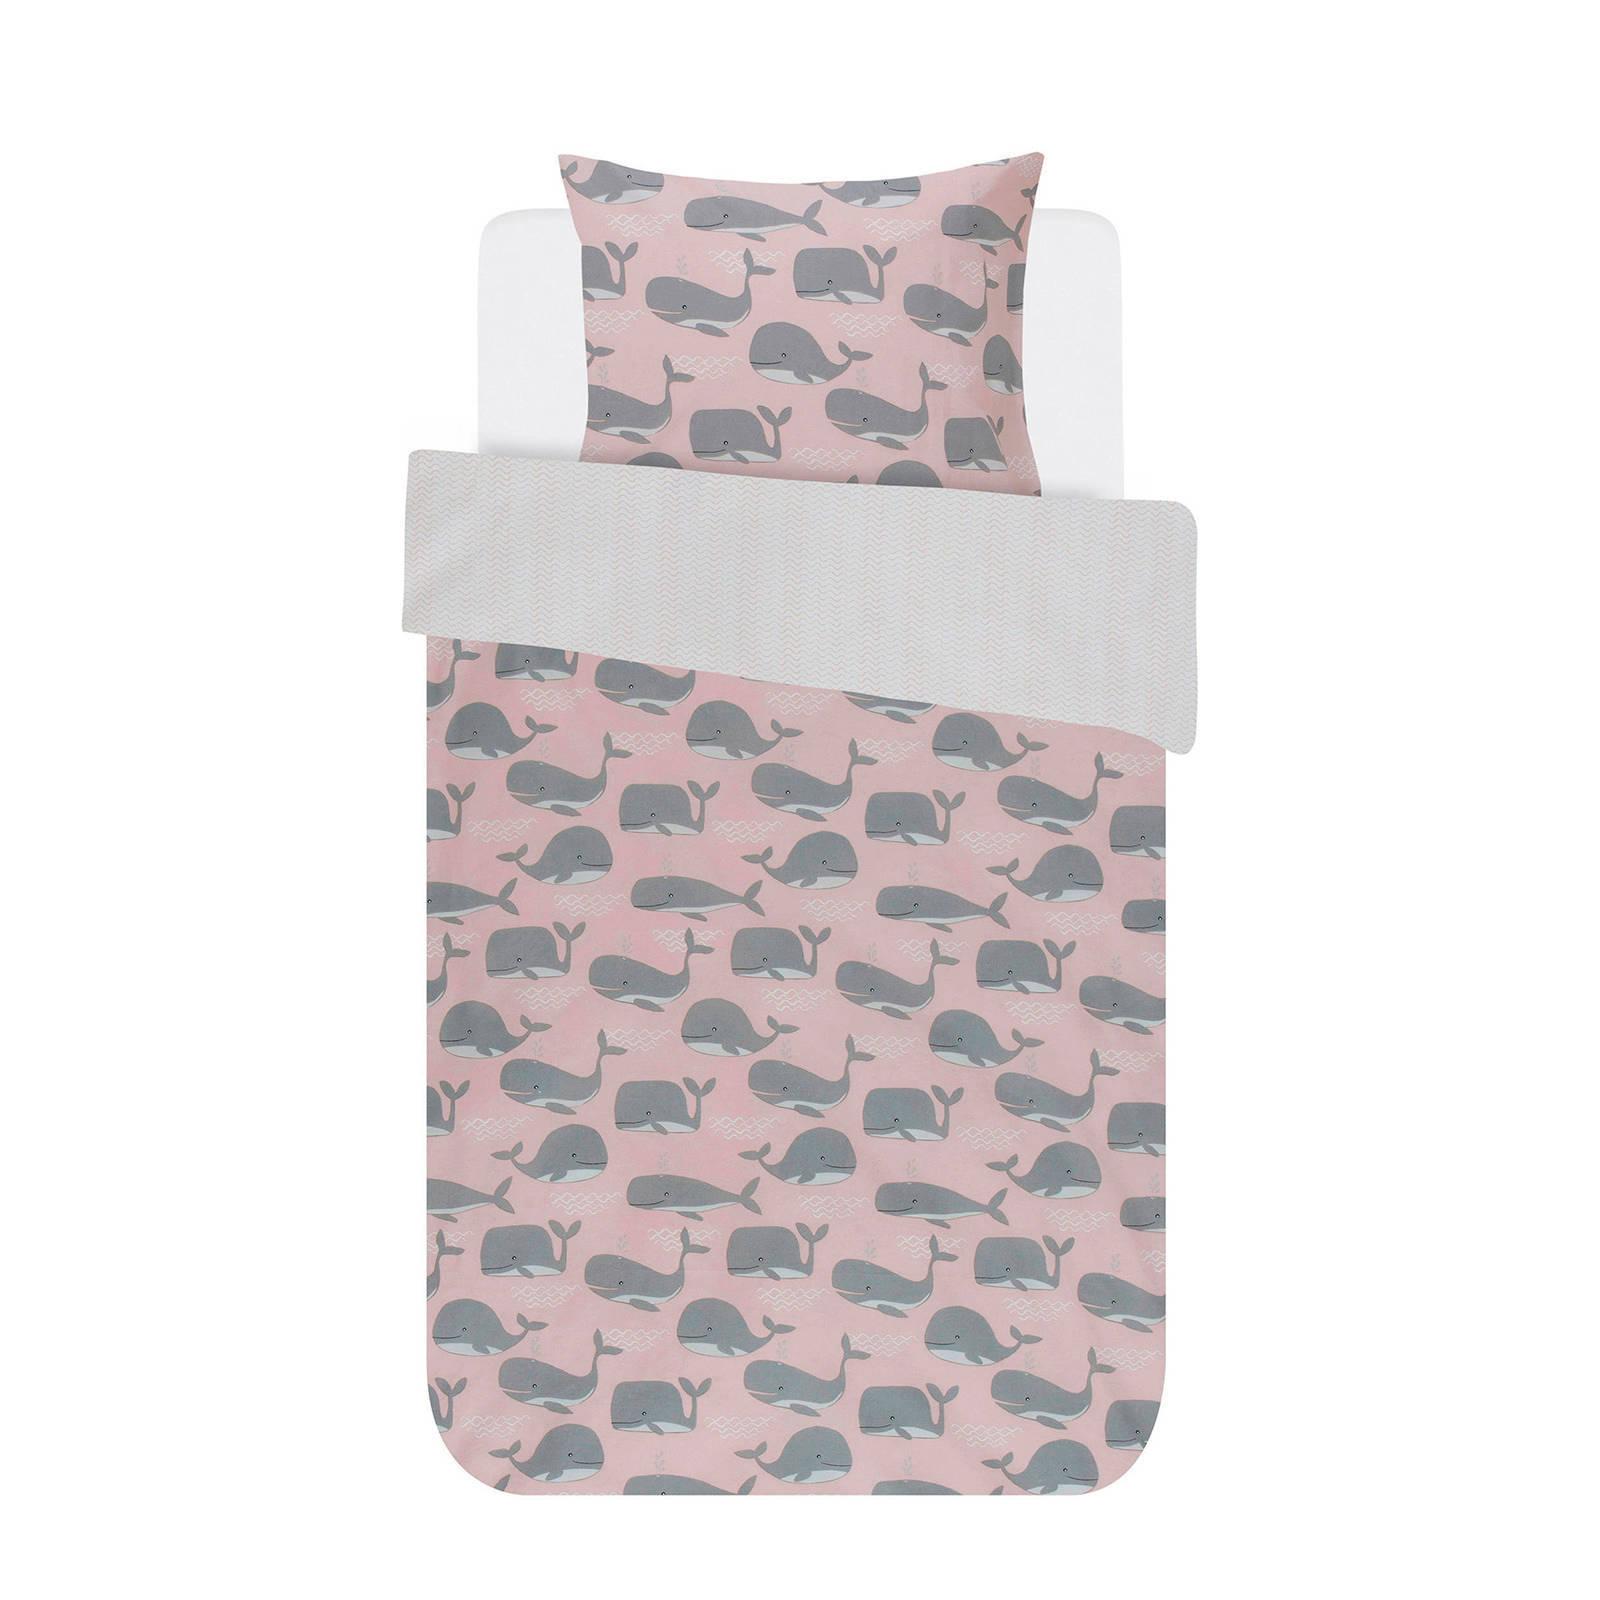 covers co katoenen peuterdekbedovertrek 120x150 cm roze